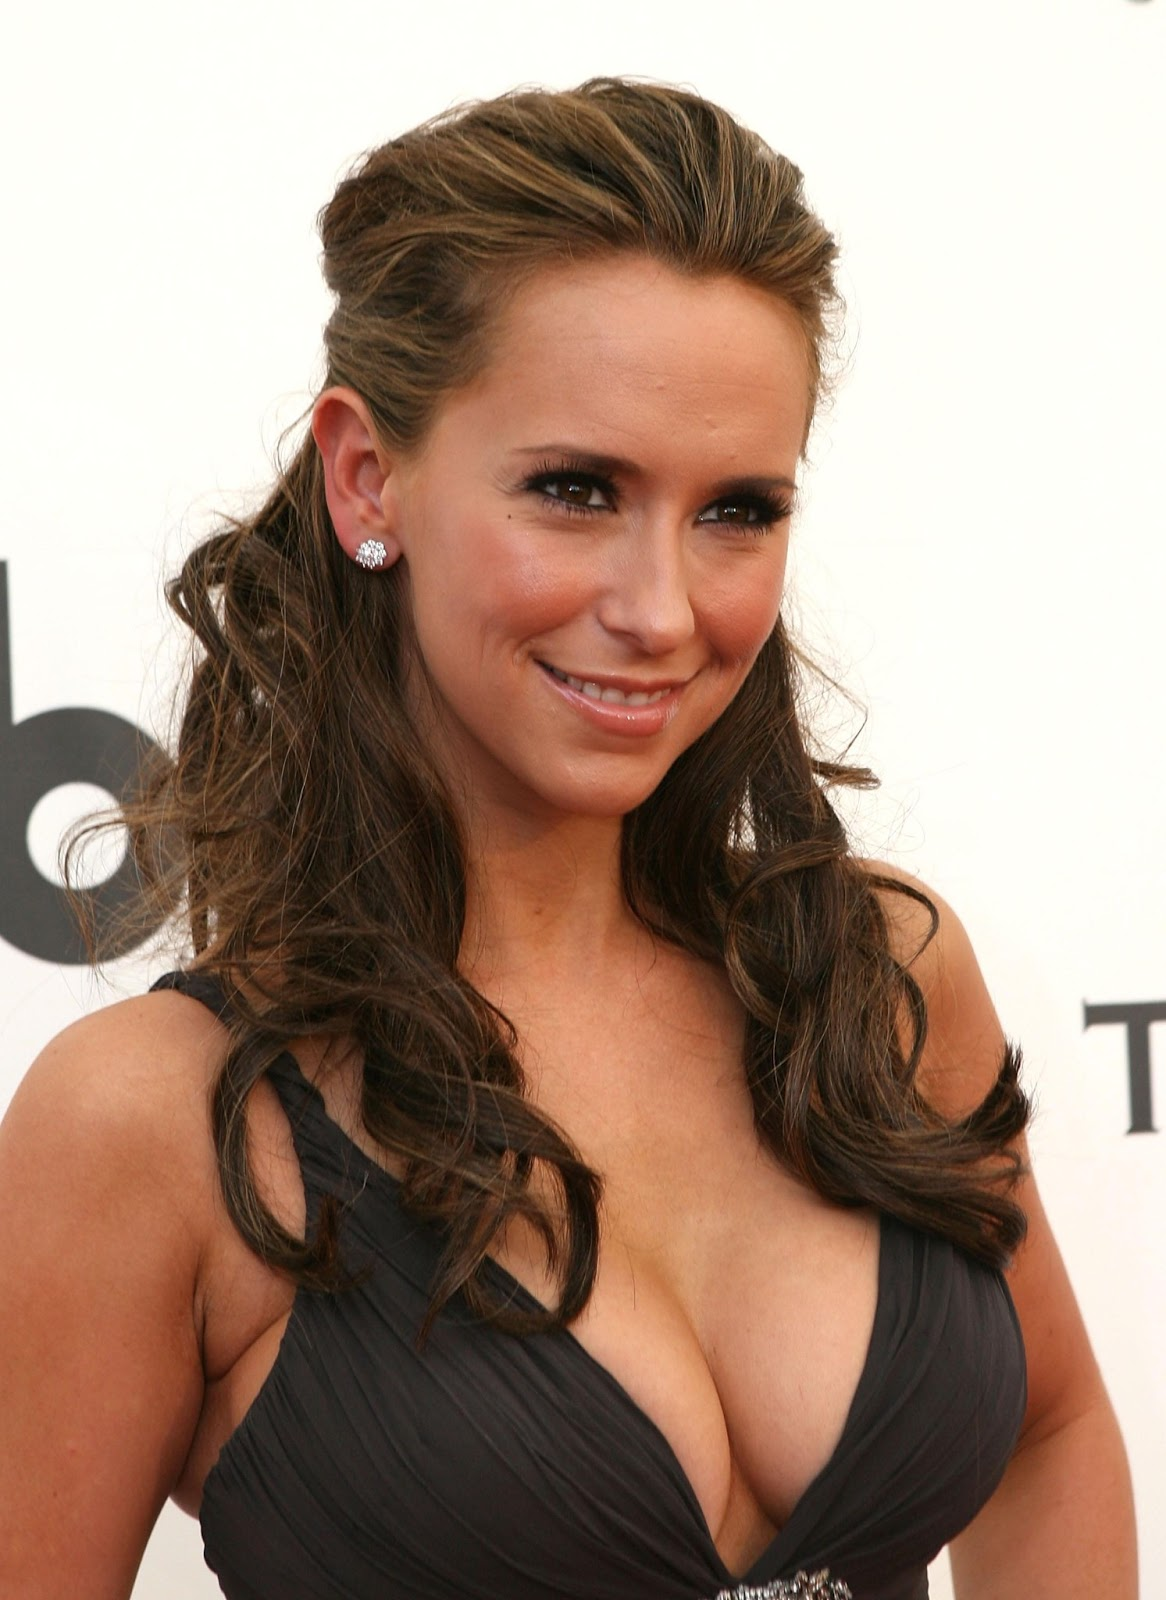 World Traveller: Top 10 hottest women - celebrities